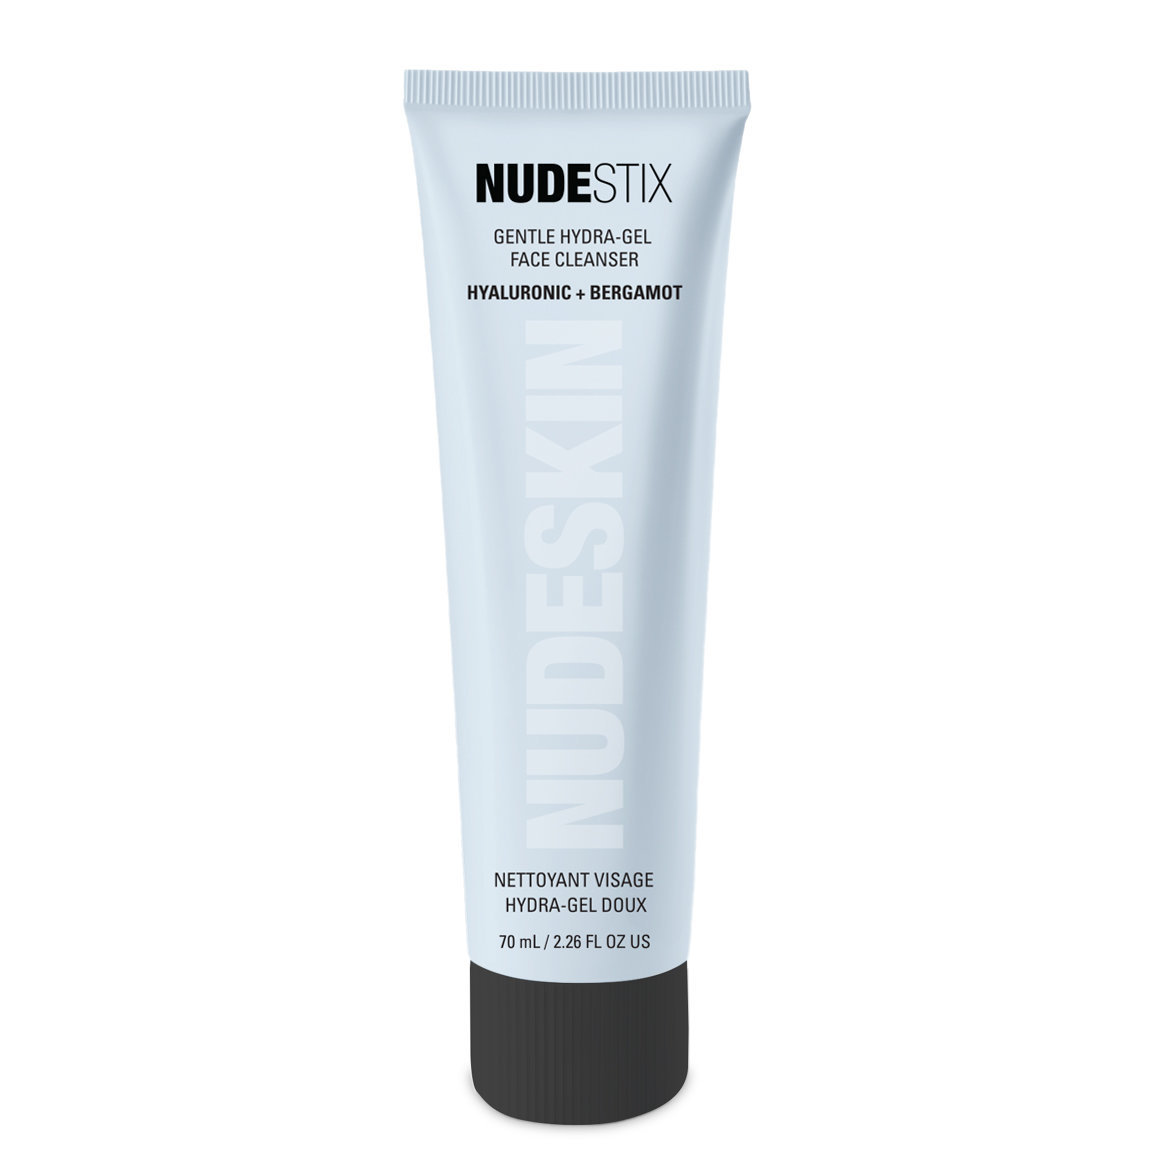 Nudestix NUDESKIN Gentle Hydra-Gel Face Cleanser alternative view 1 - product swatch.